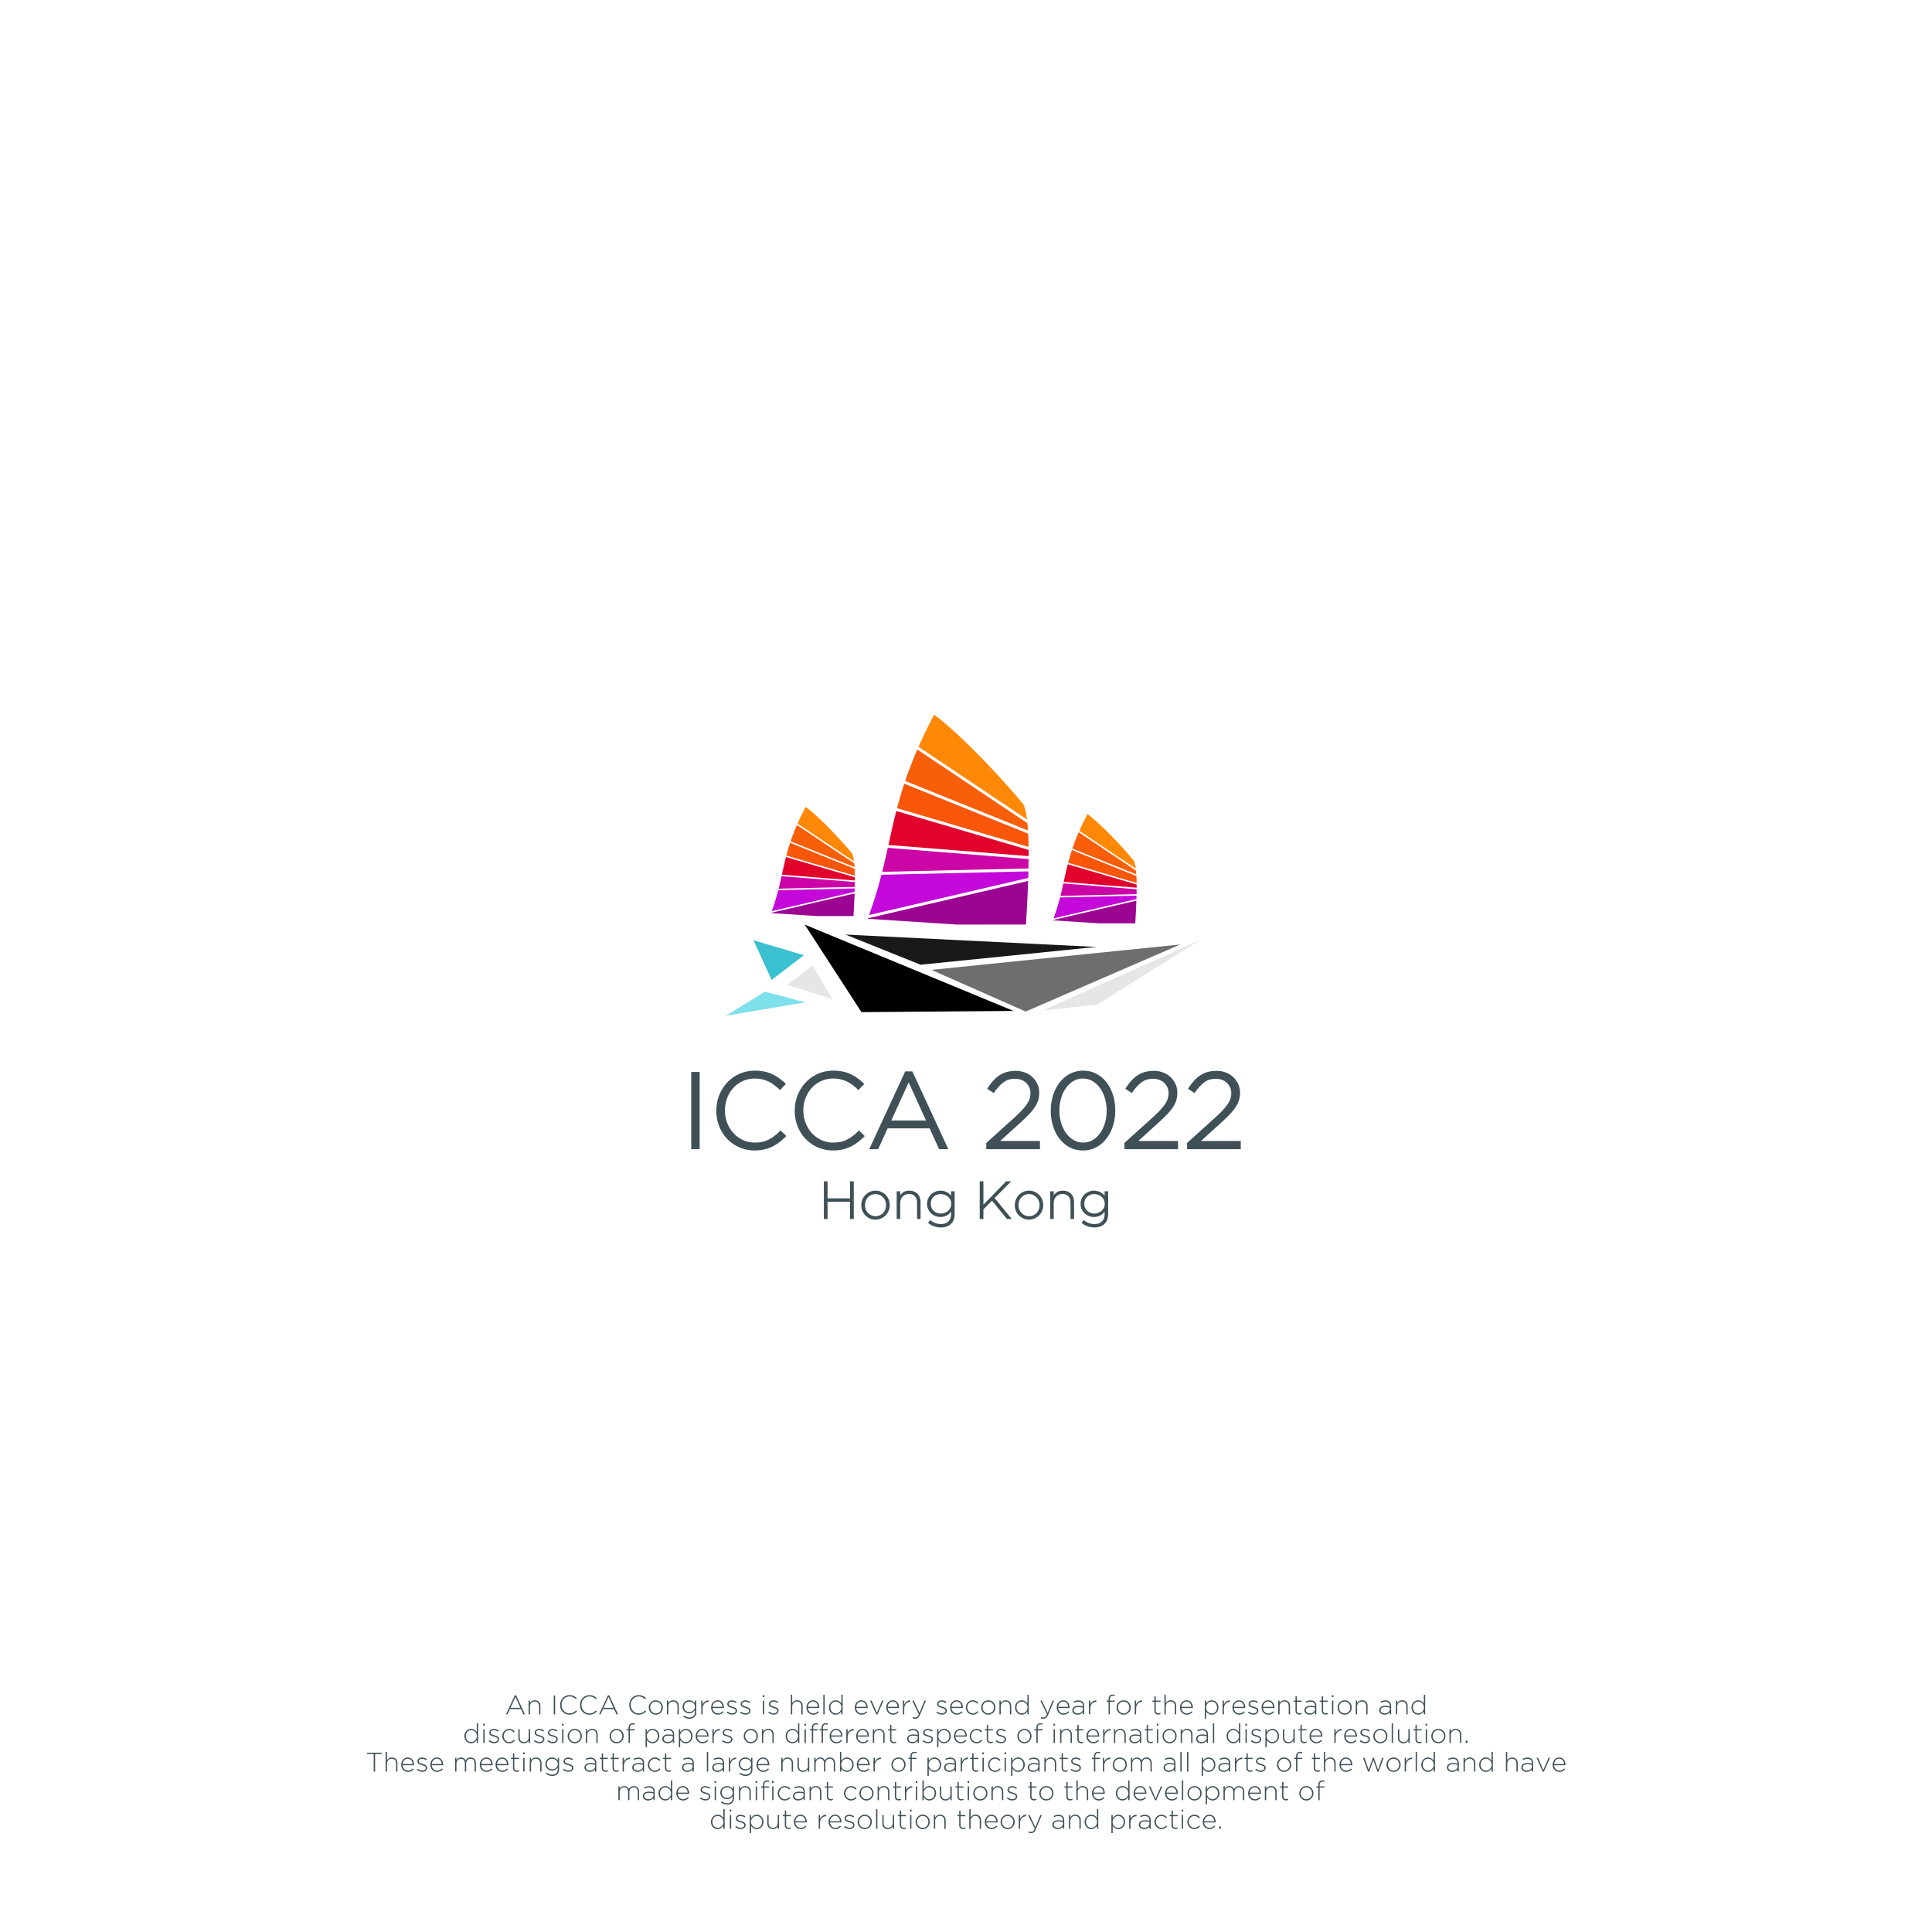 Create a vibrant logo to showcase Hong Kong (ICCA Congress Hong Kong 2022)